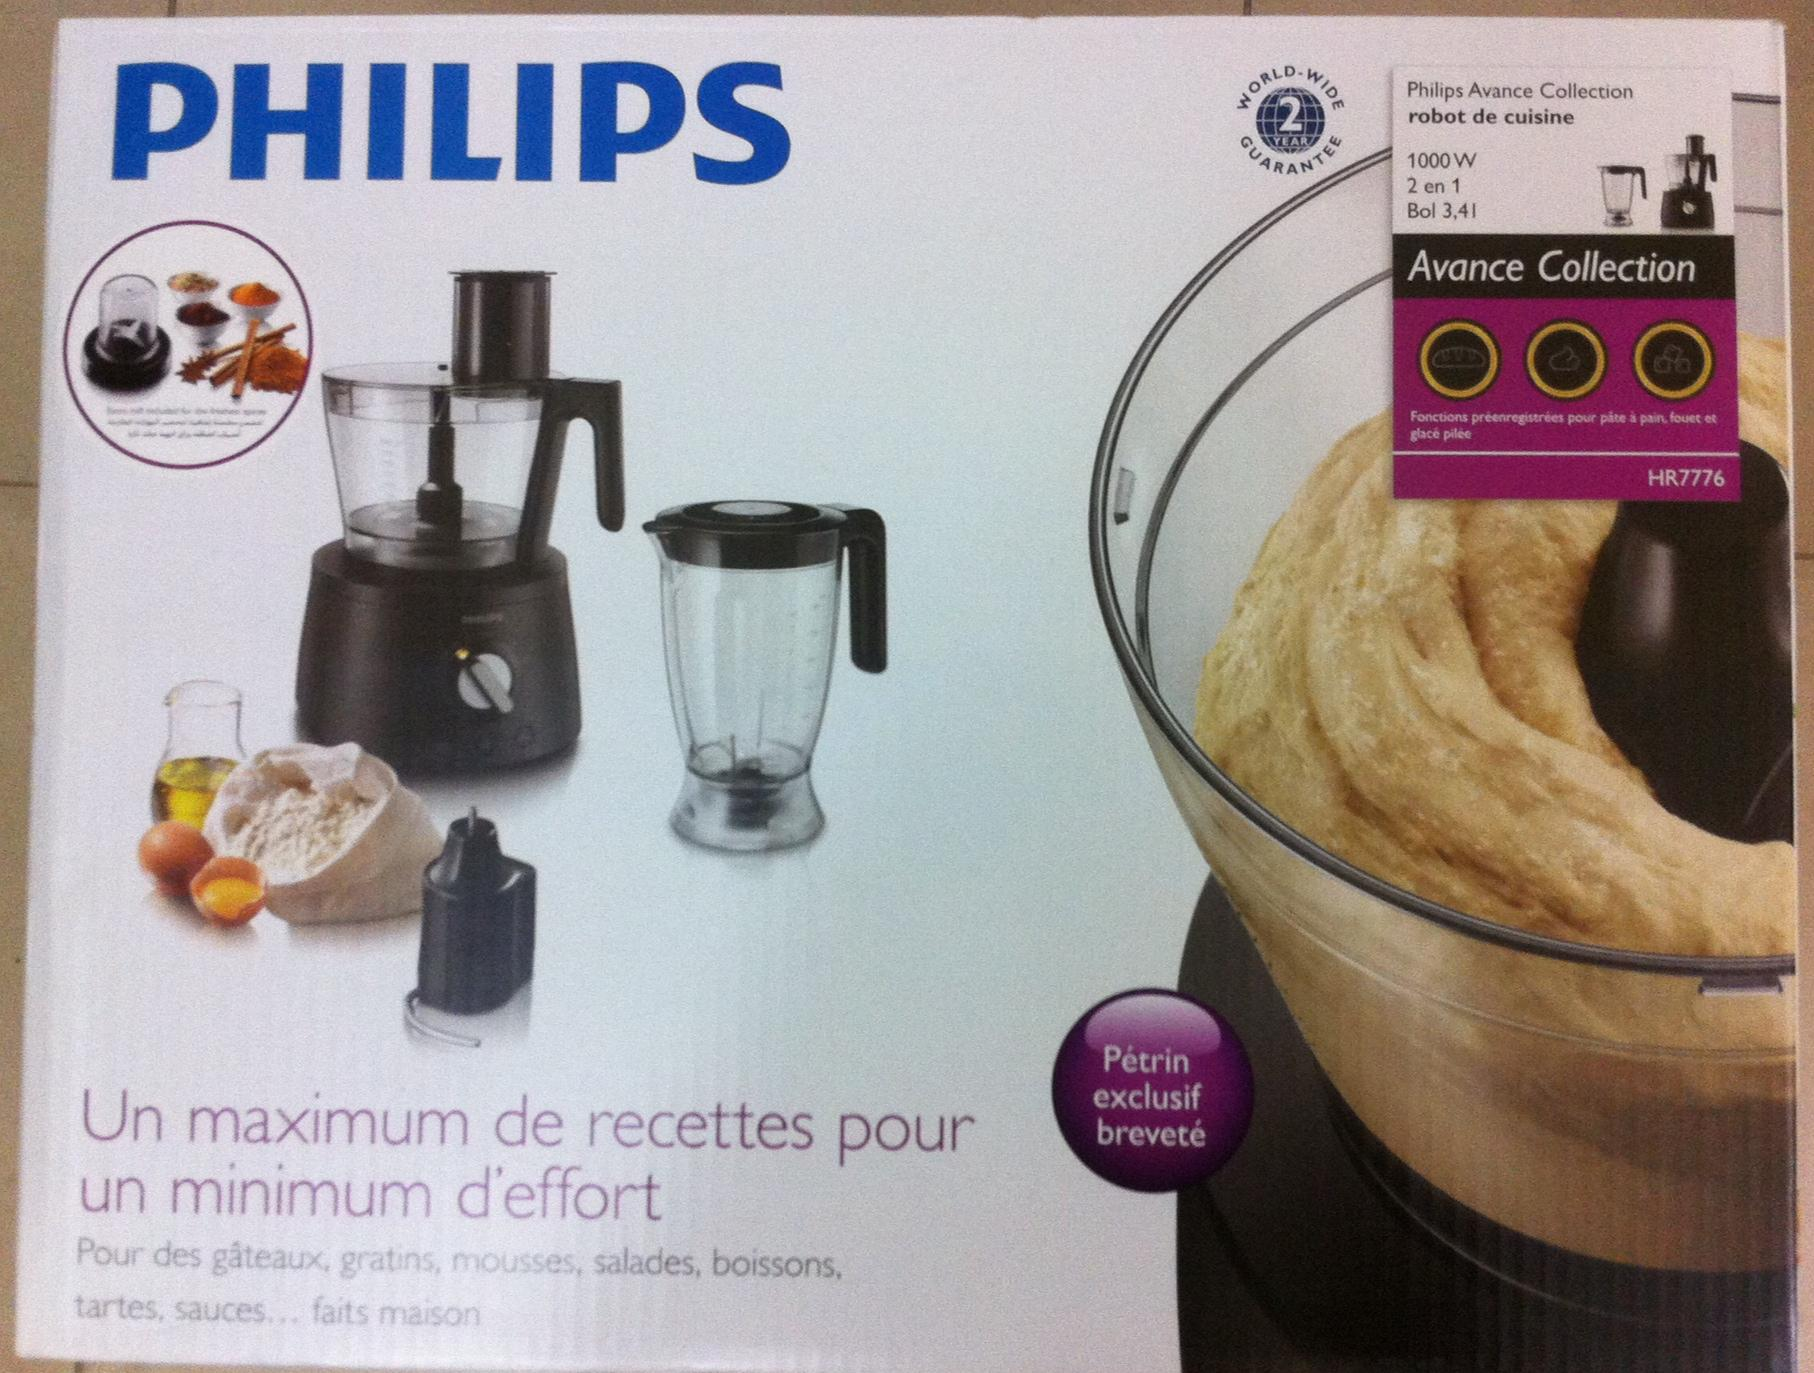 Brand New Philips Food Processor HR7776   Qatar Living